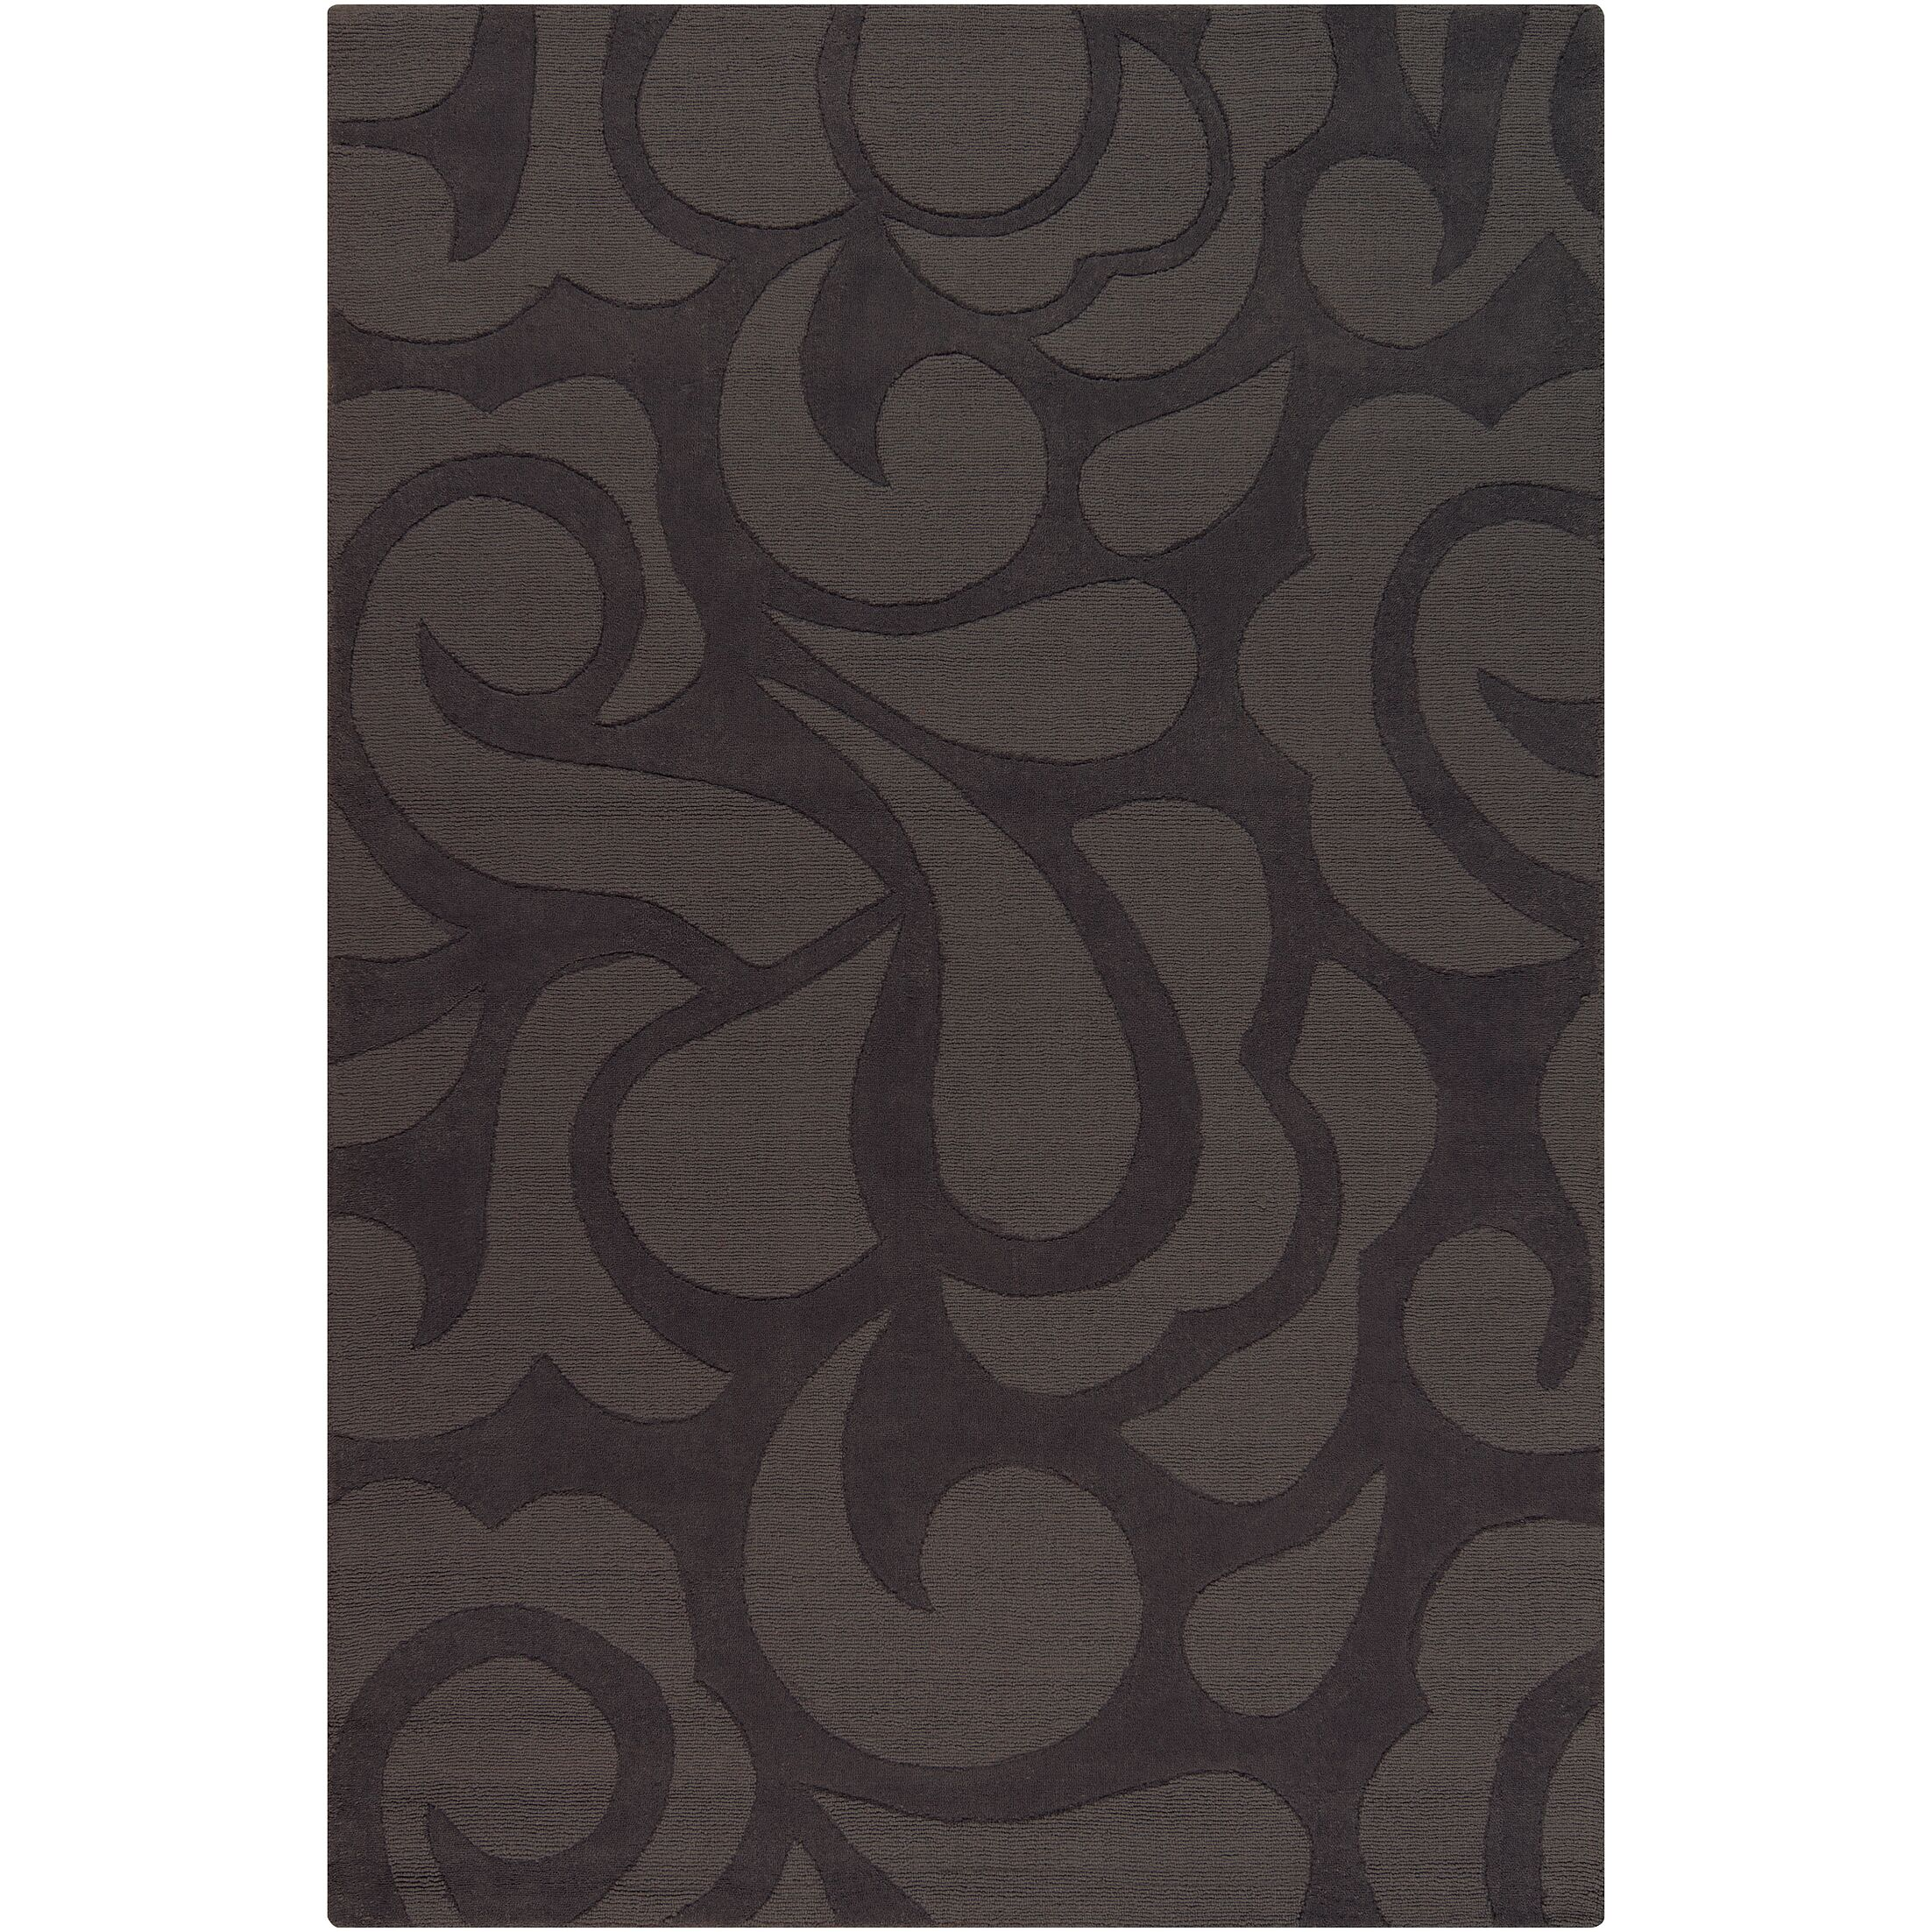 Stehle Grey Area Rug Rug Size: 5' x 7'6